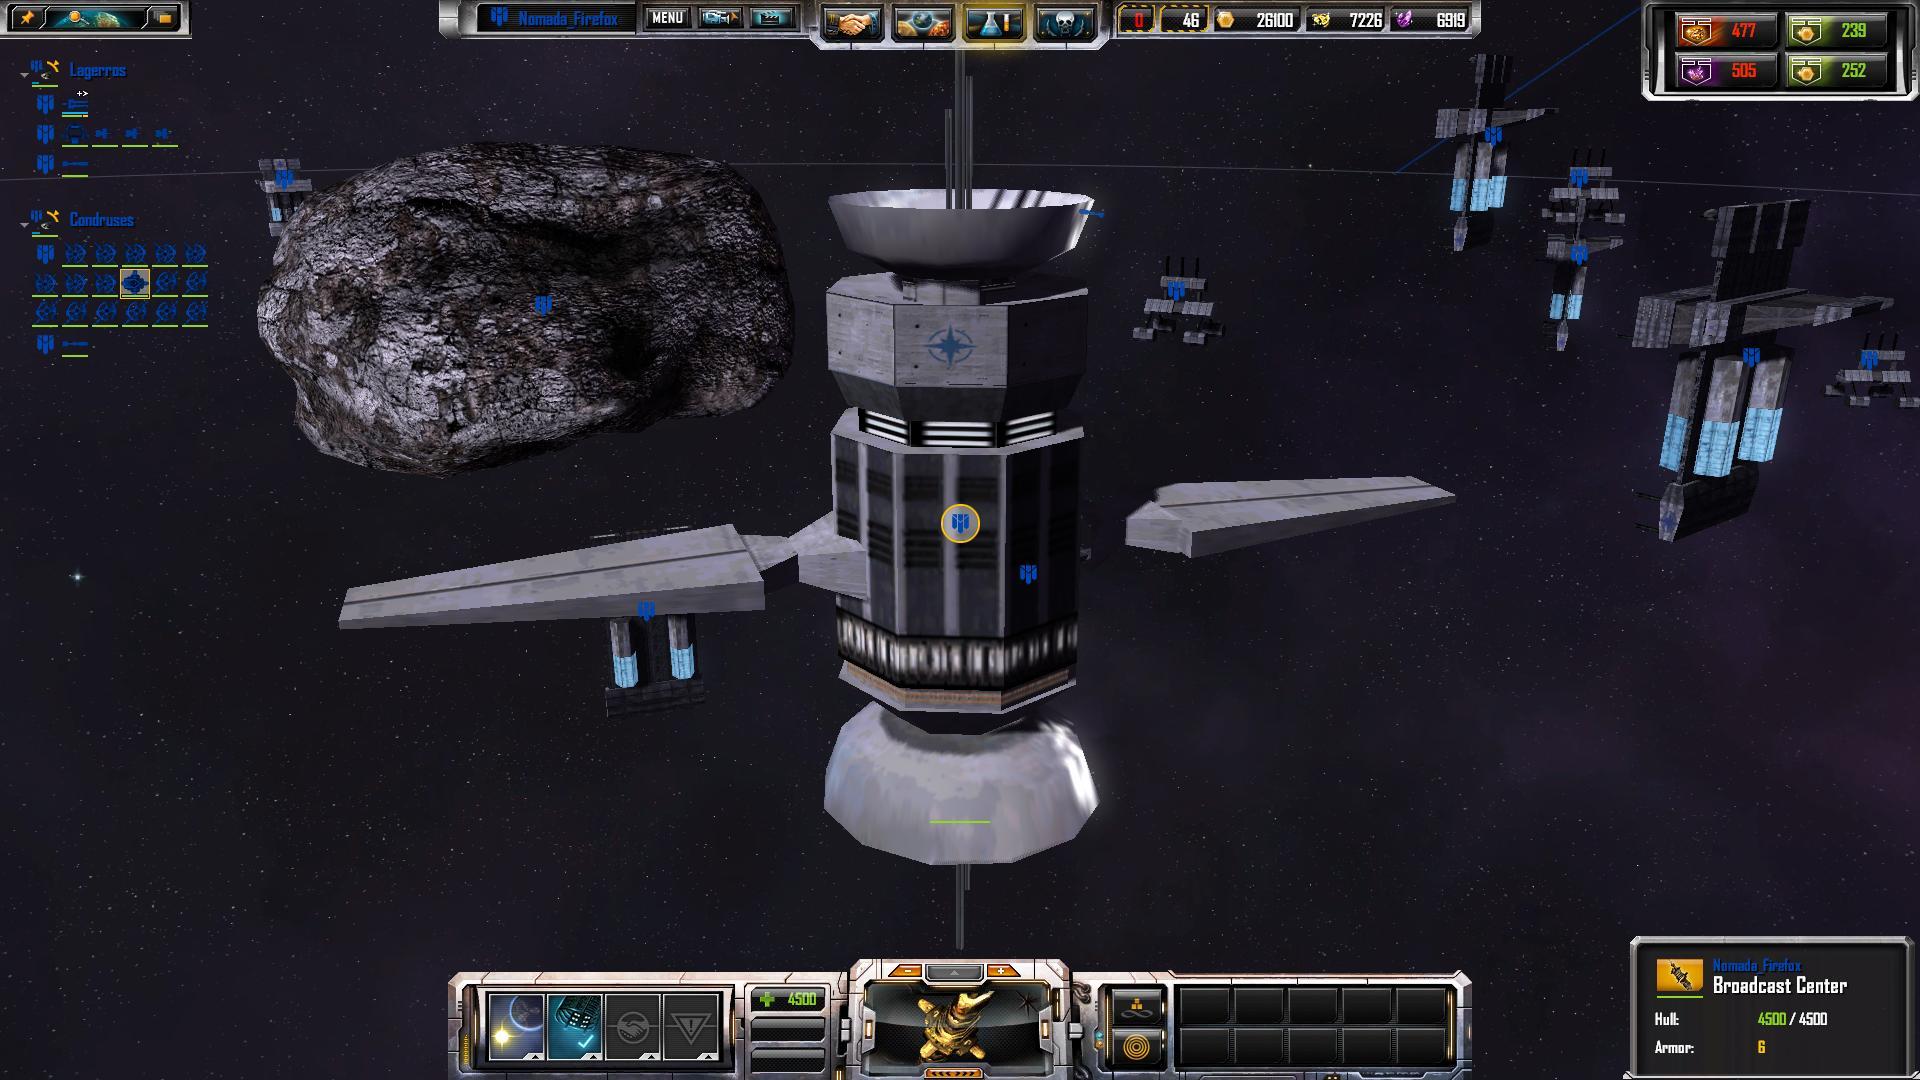 Mod Wing Commander Alliance Rebellion 1 91 Released Forum Post By Nomada Firefox